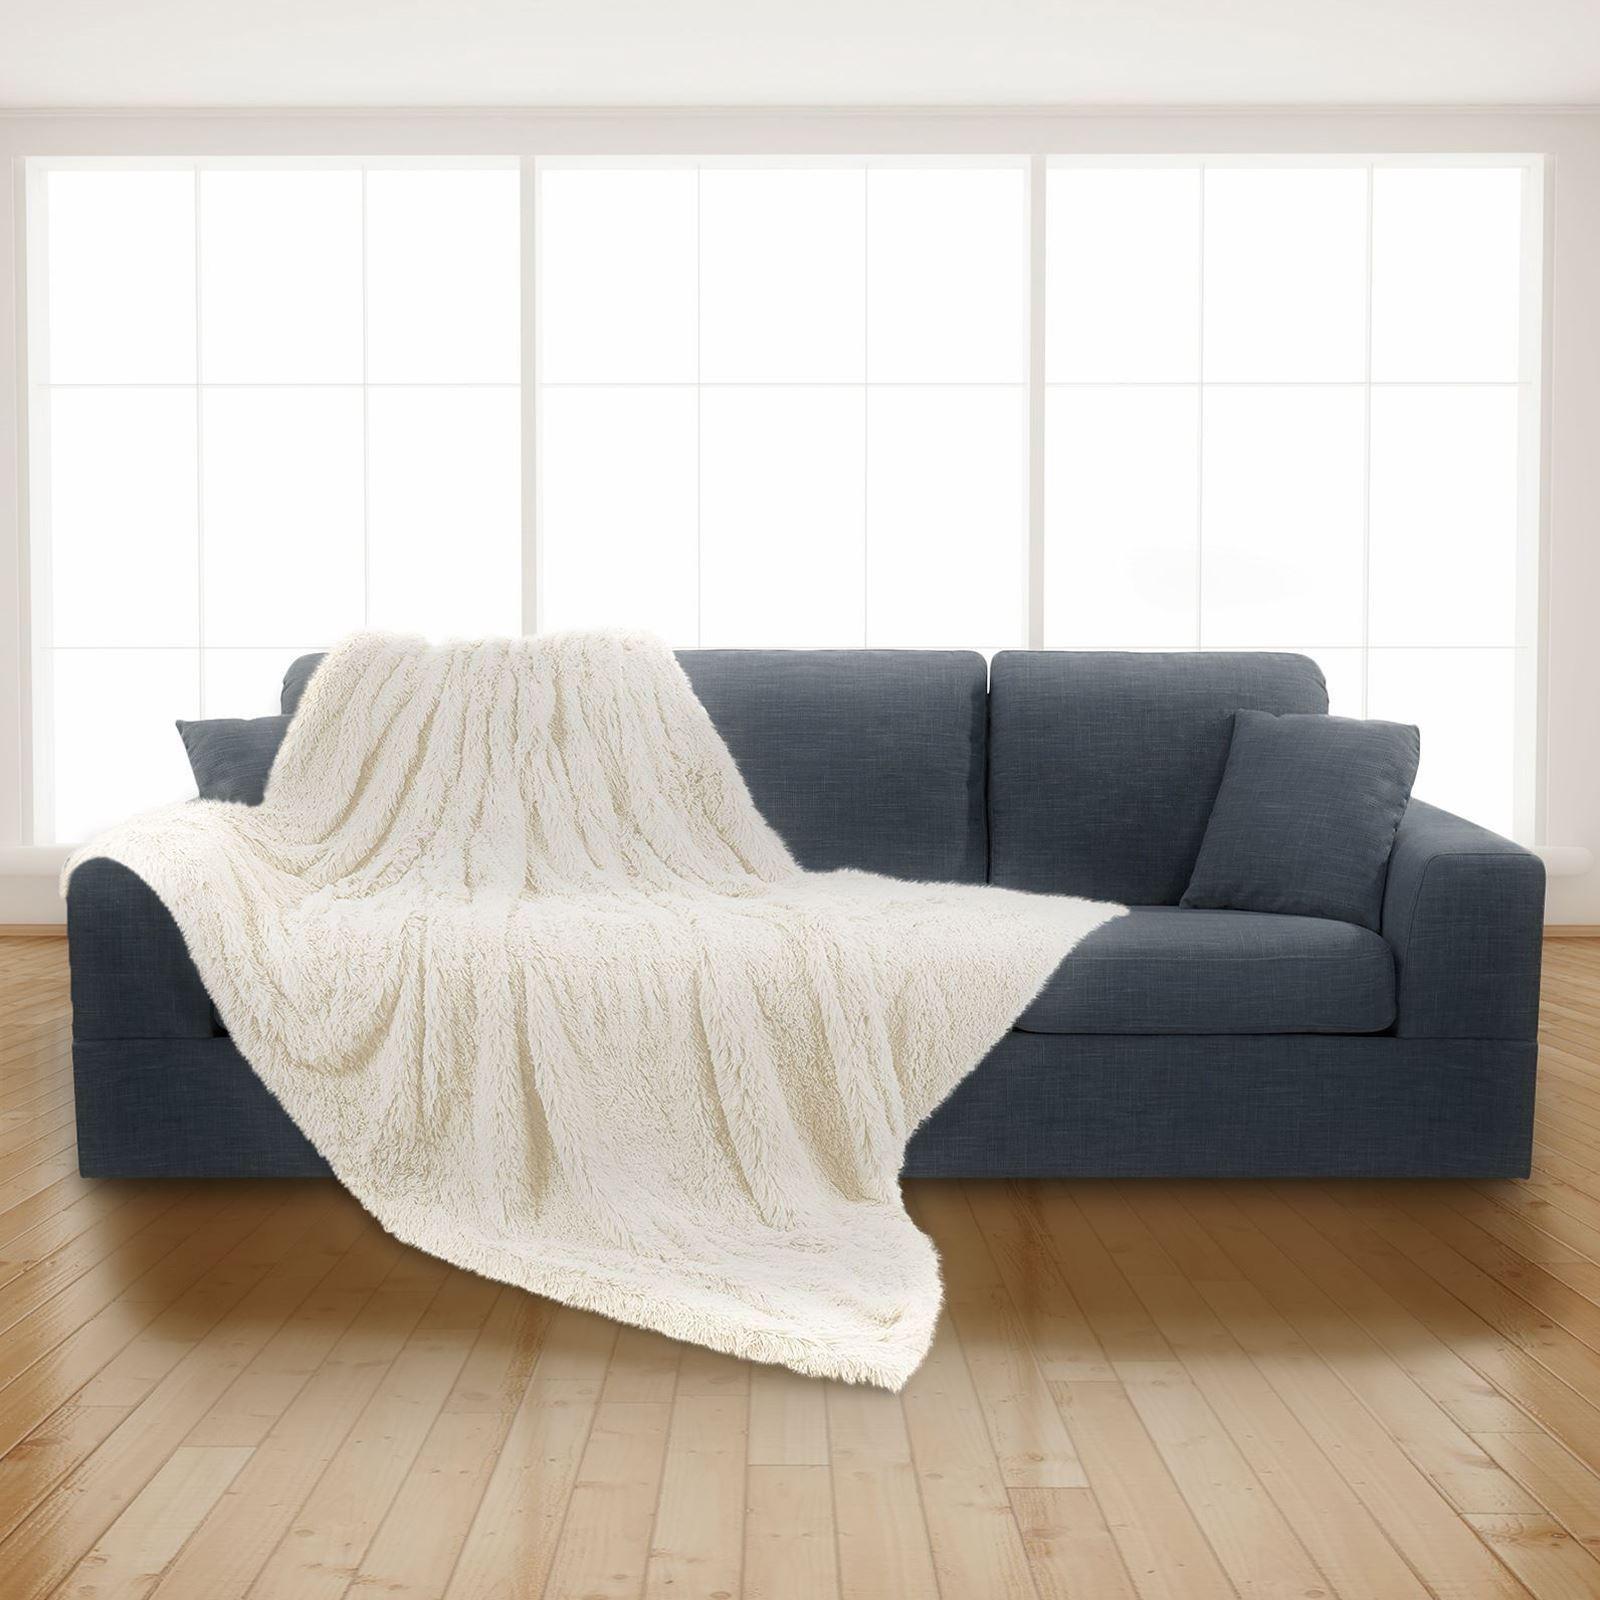 Luxury Super Soft Long Pile Throw Blanket Faux Fur Warm Shaggy